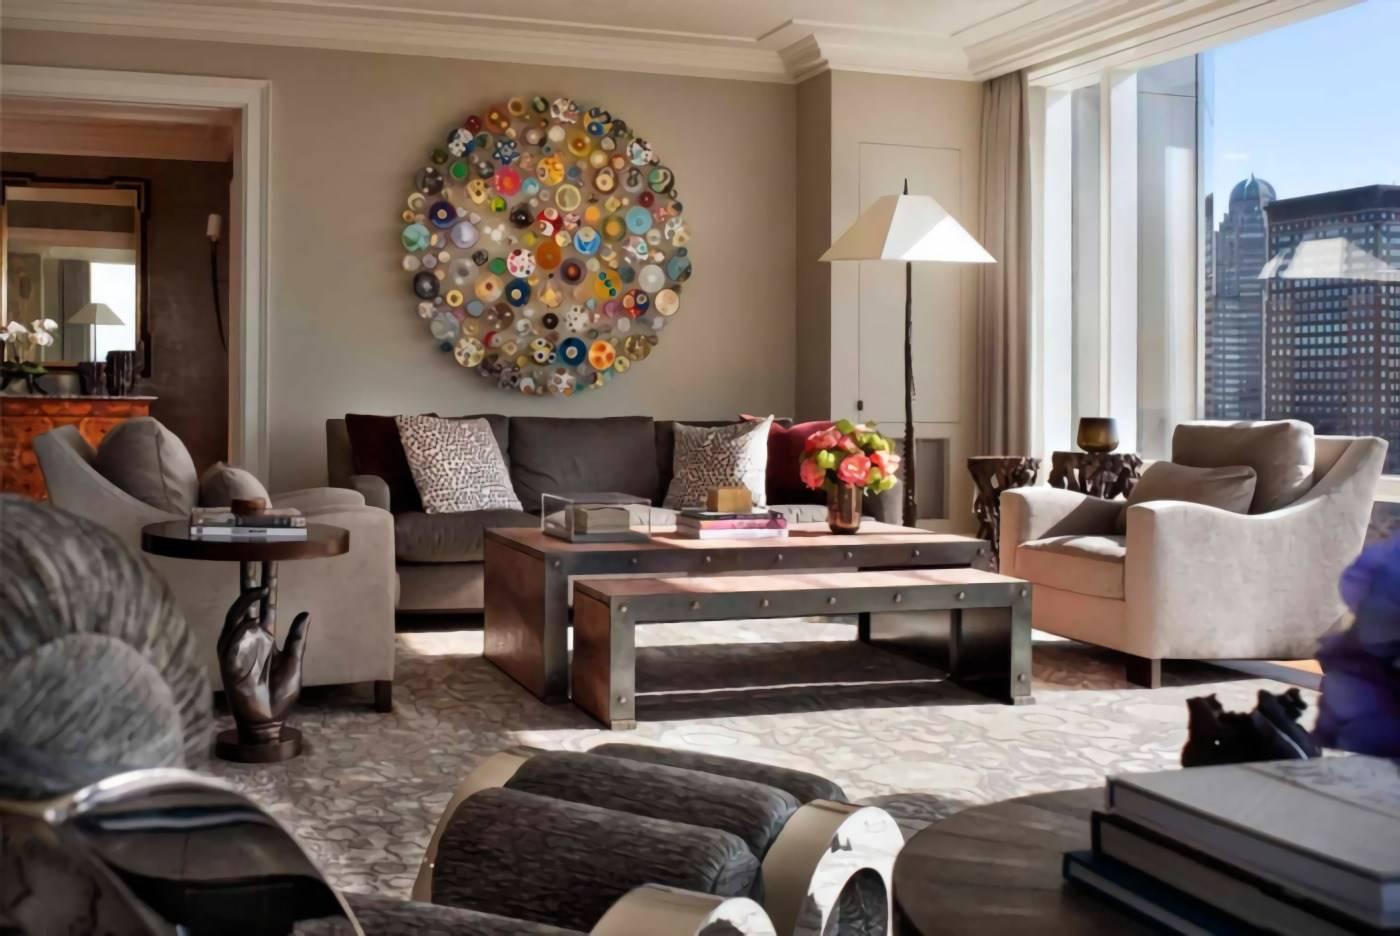 design wohnzimmer mobel holz beautiful i0 wp stormrider clash wp content of design wohnzimmer mobel holz